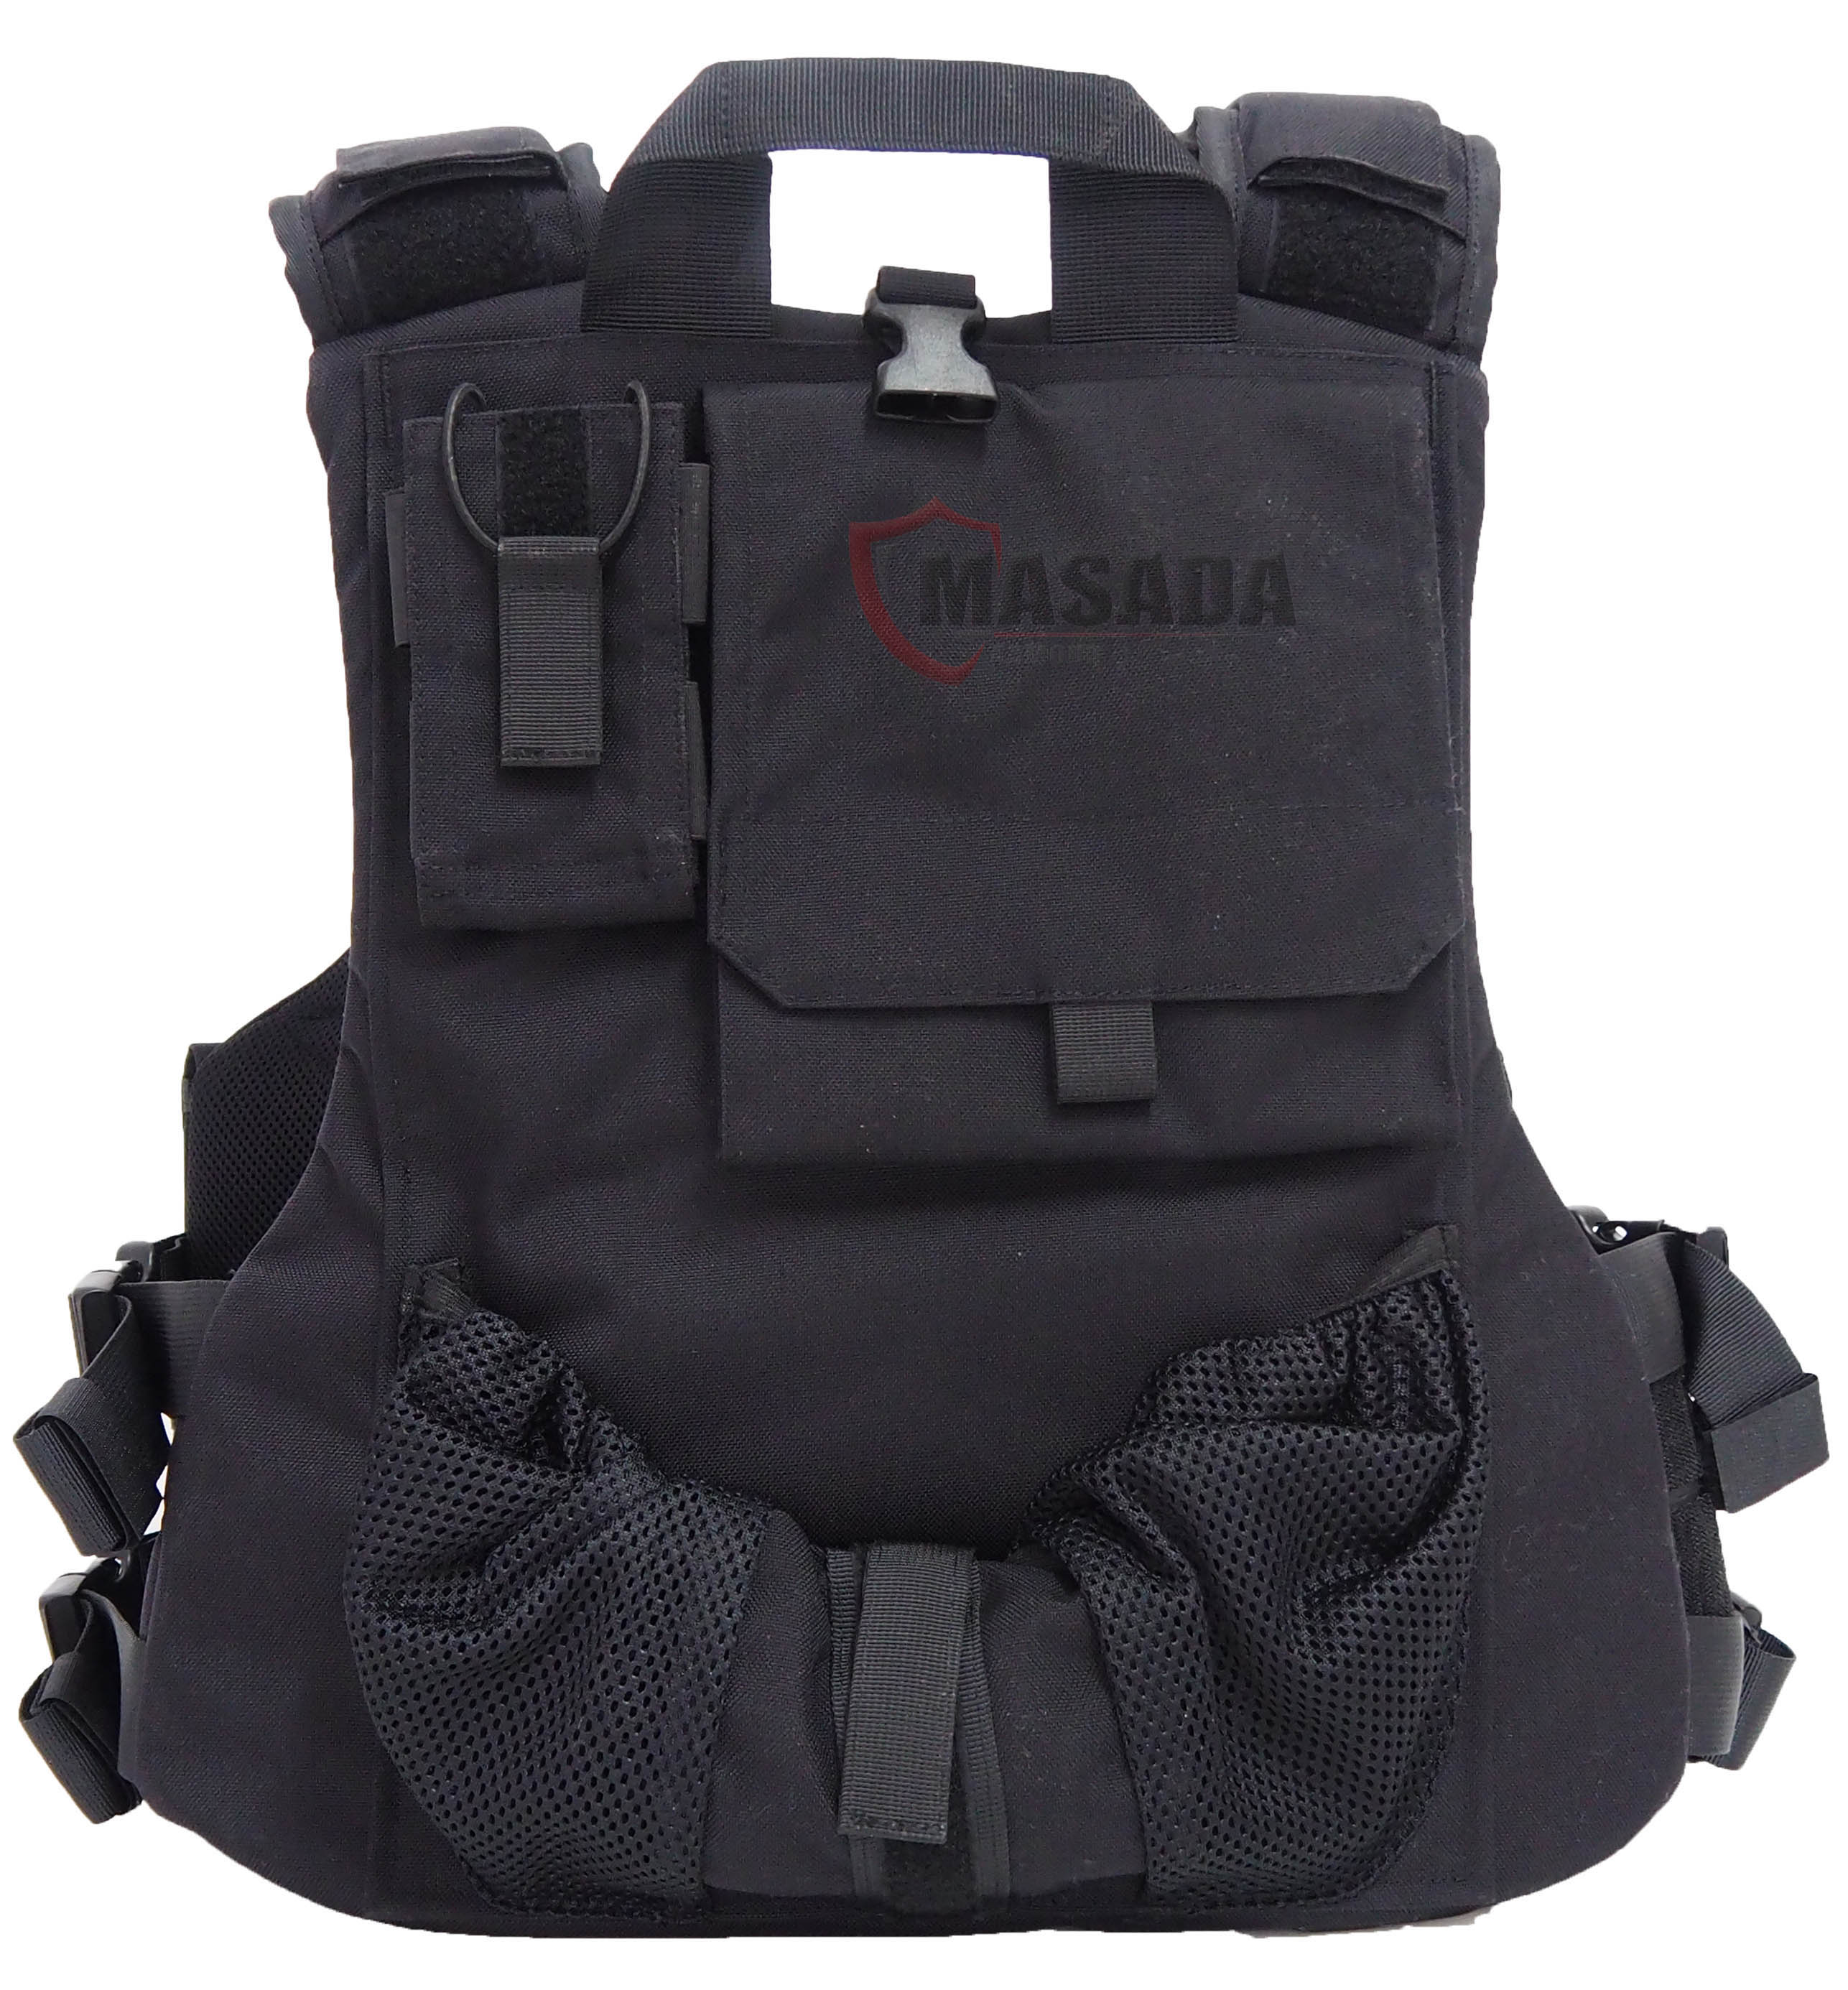 Tactical bulleproof vest with an inner belt - black